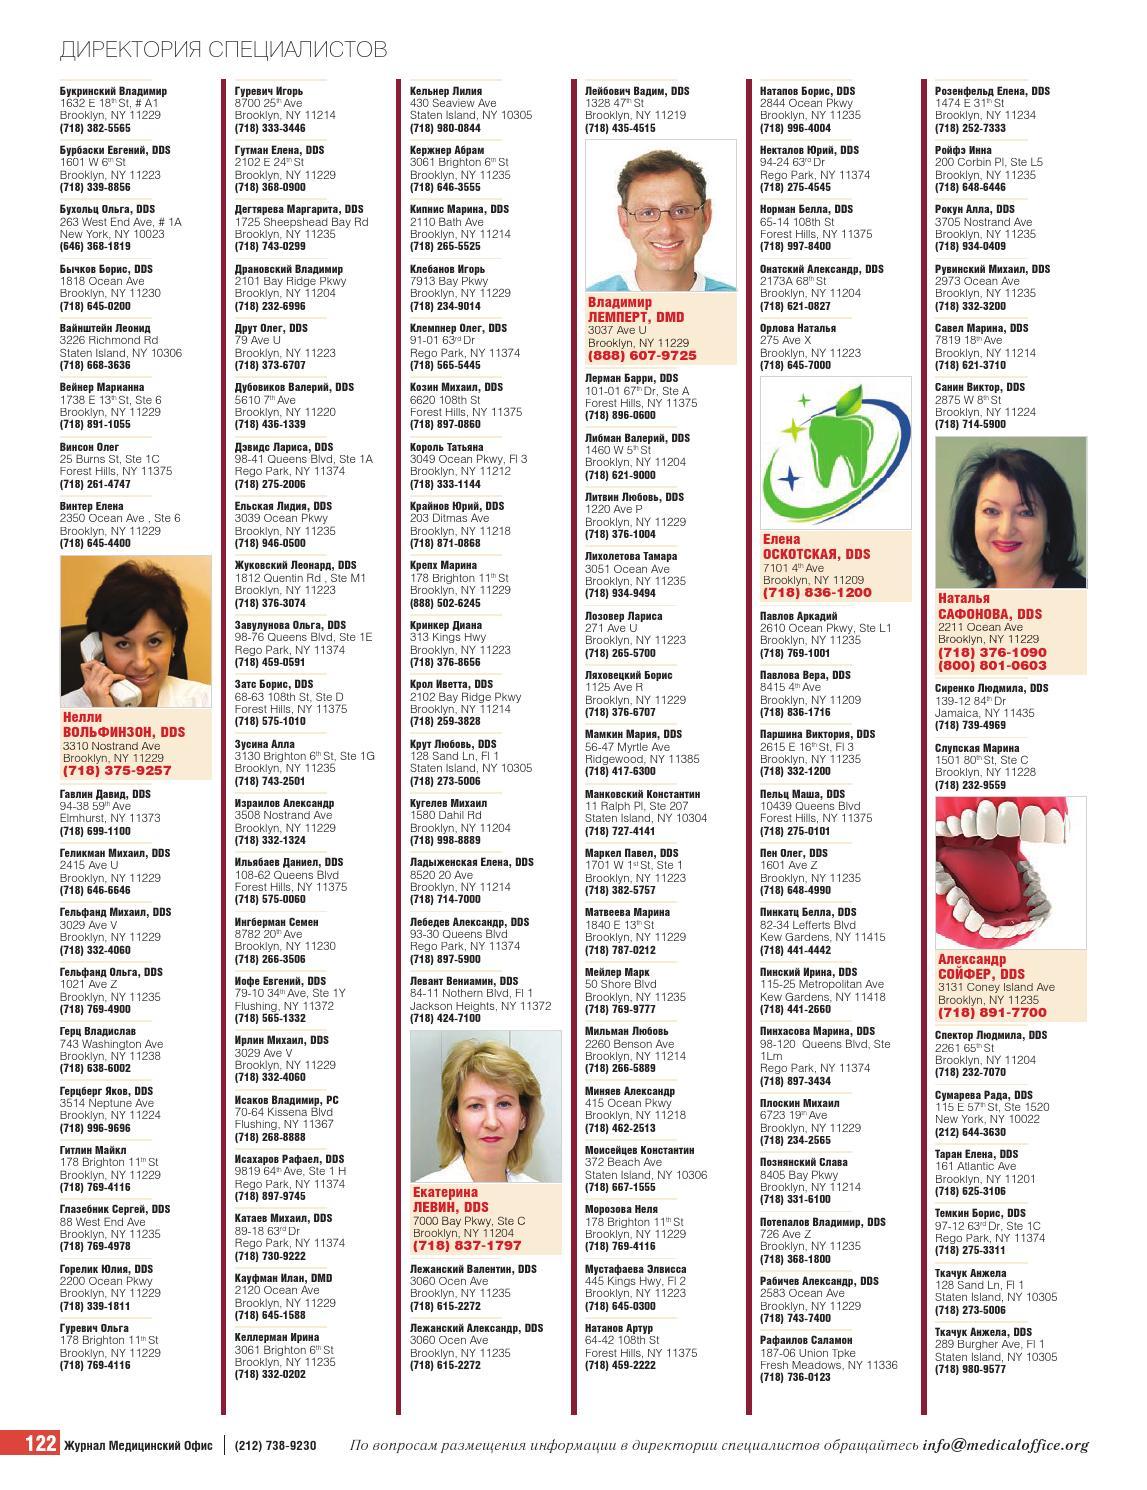 Medical Office Magazine #188